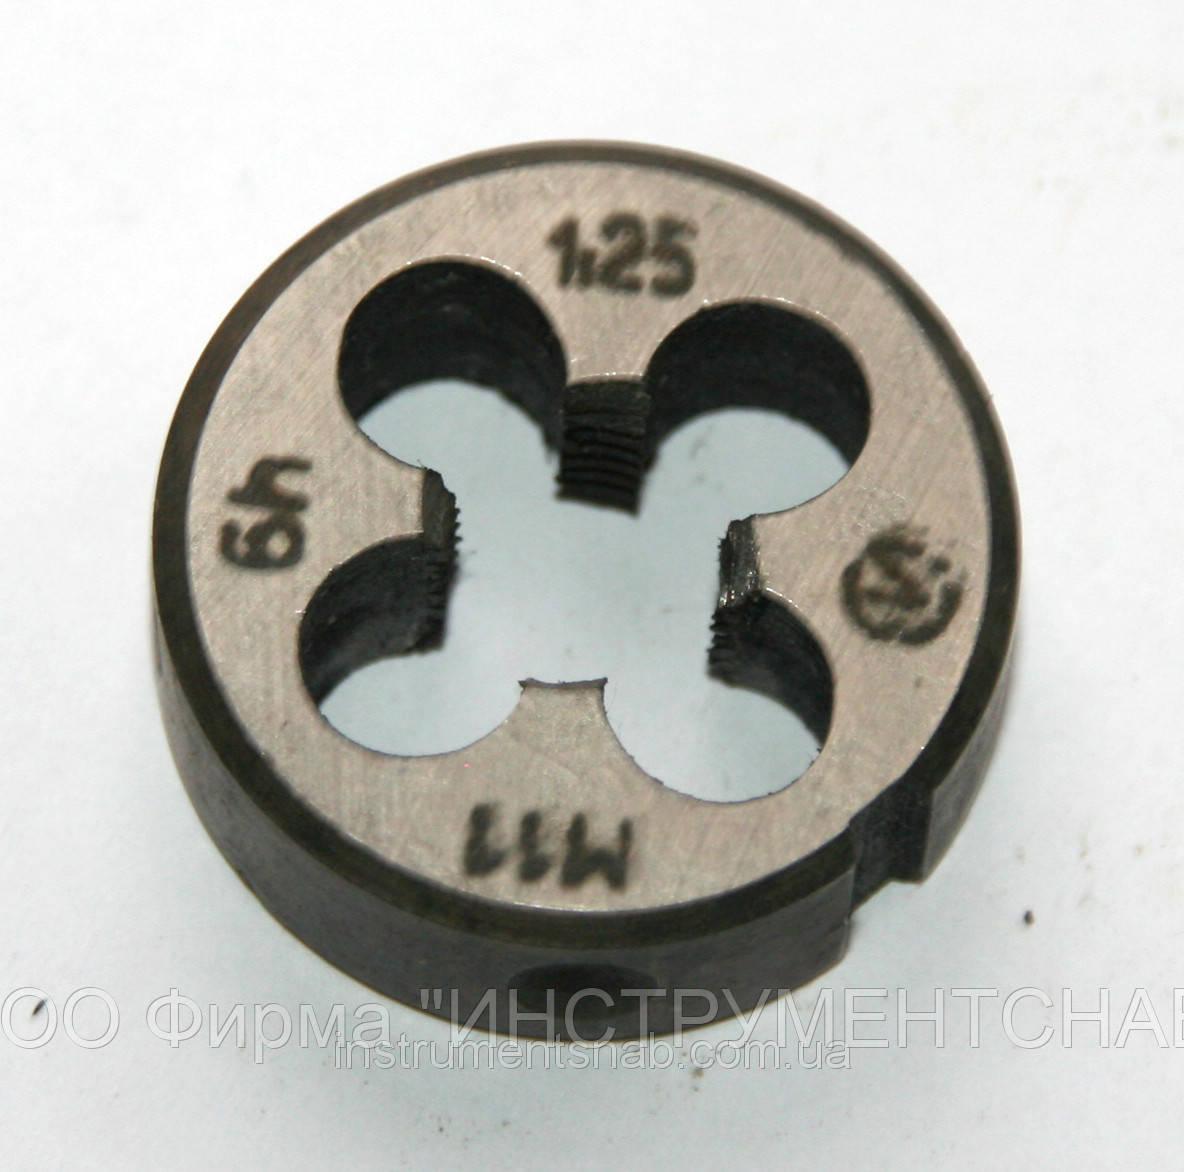 Плашка М-11х1,25, 9ХС, мелкий шаг